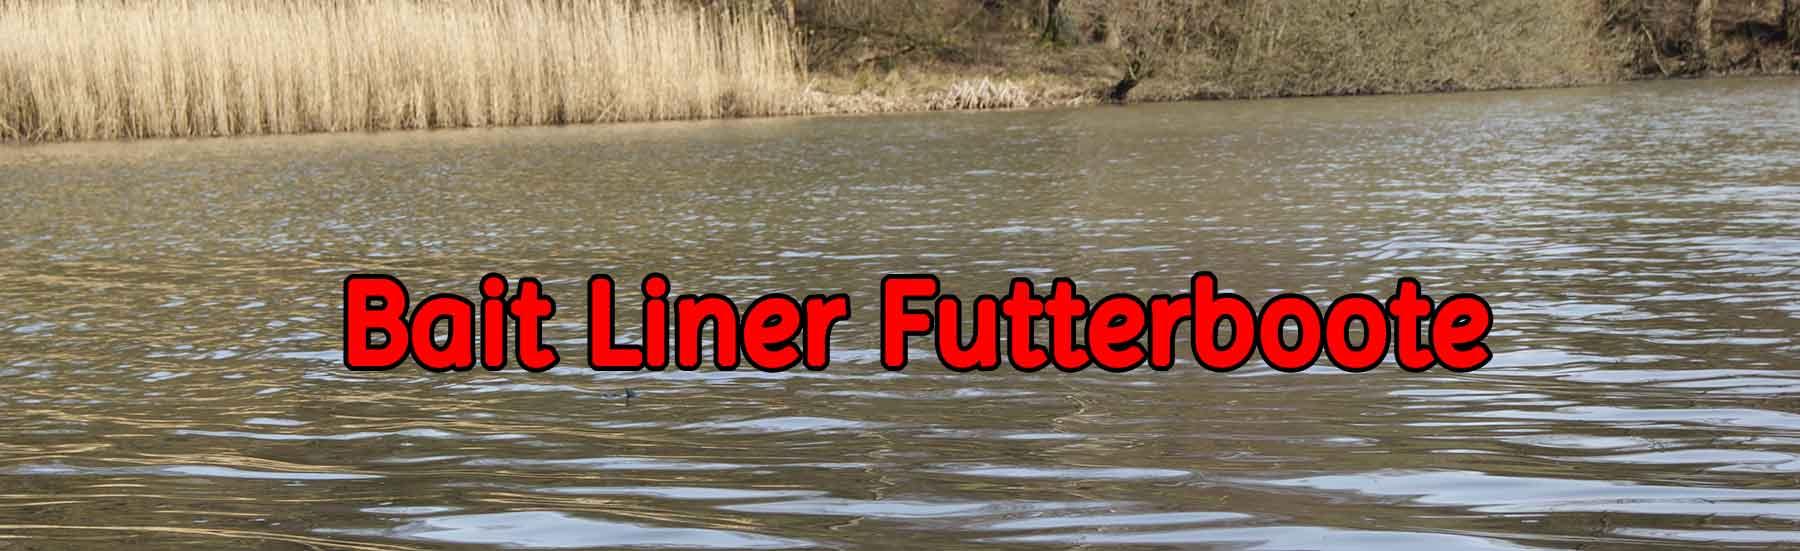 Bait Liner Futterboote